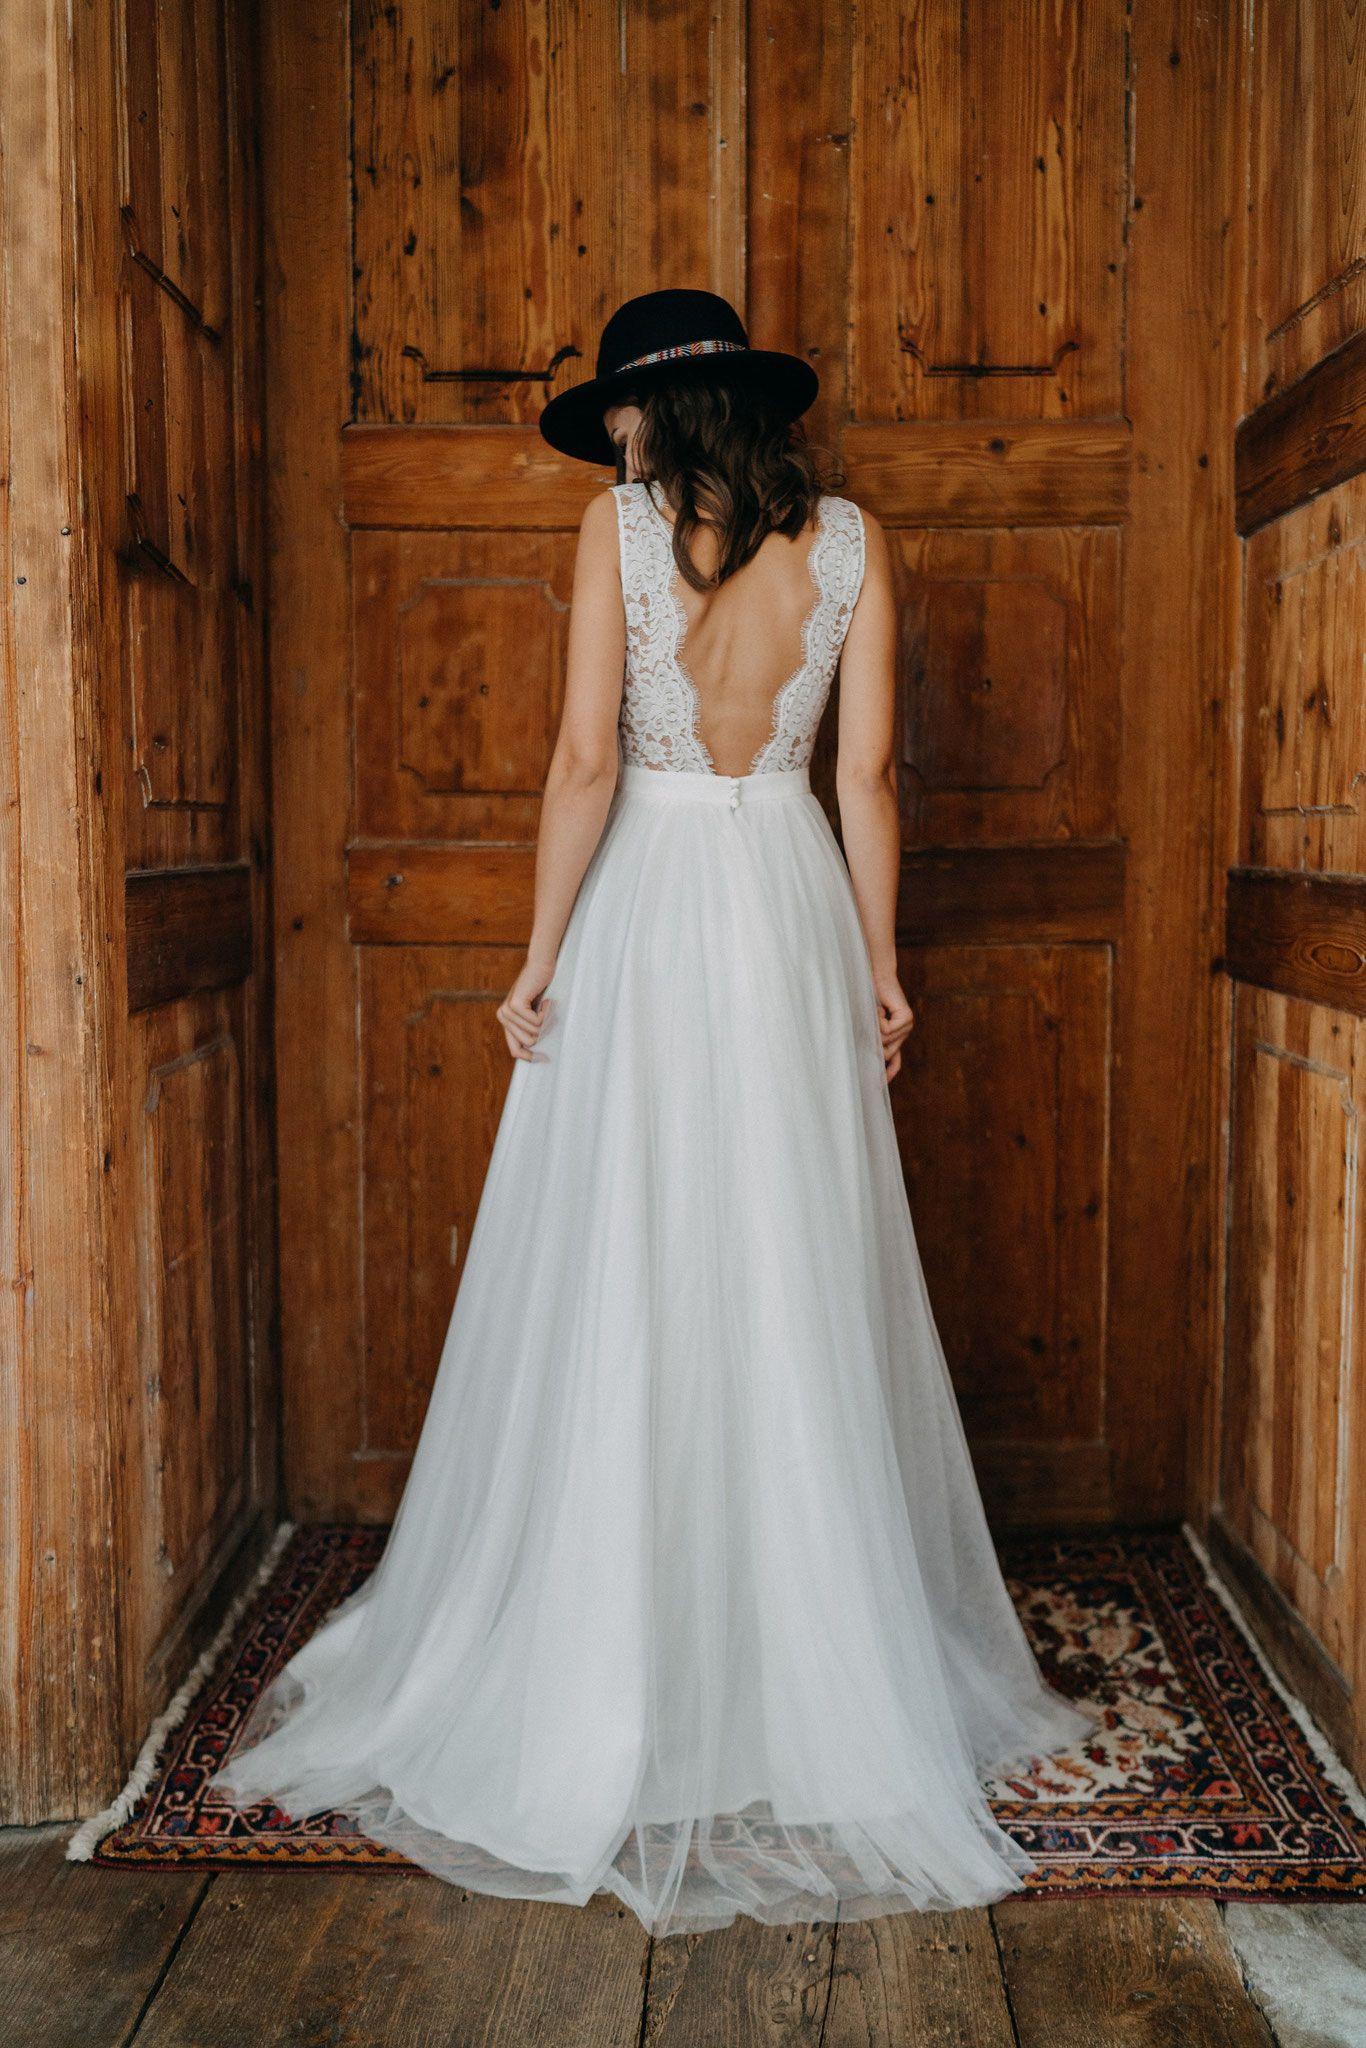 Brautmode I Brautkleid I Hochzeit I Wedding I Spitze I Boho